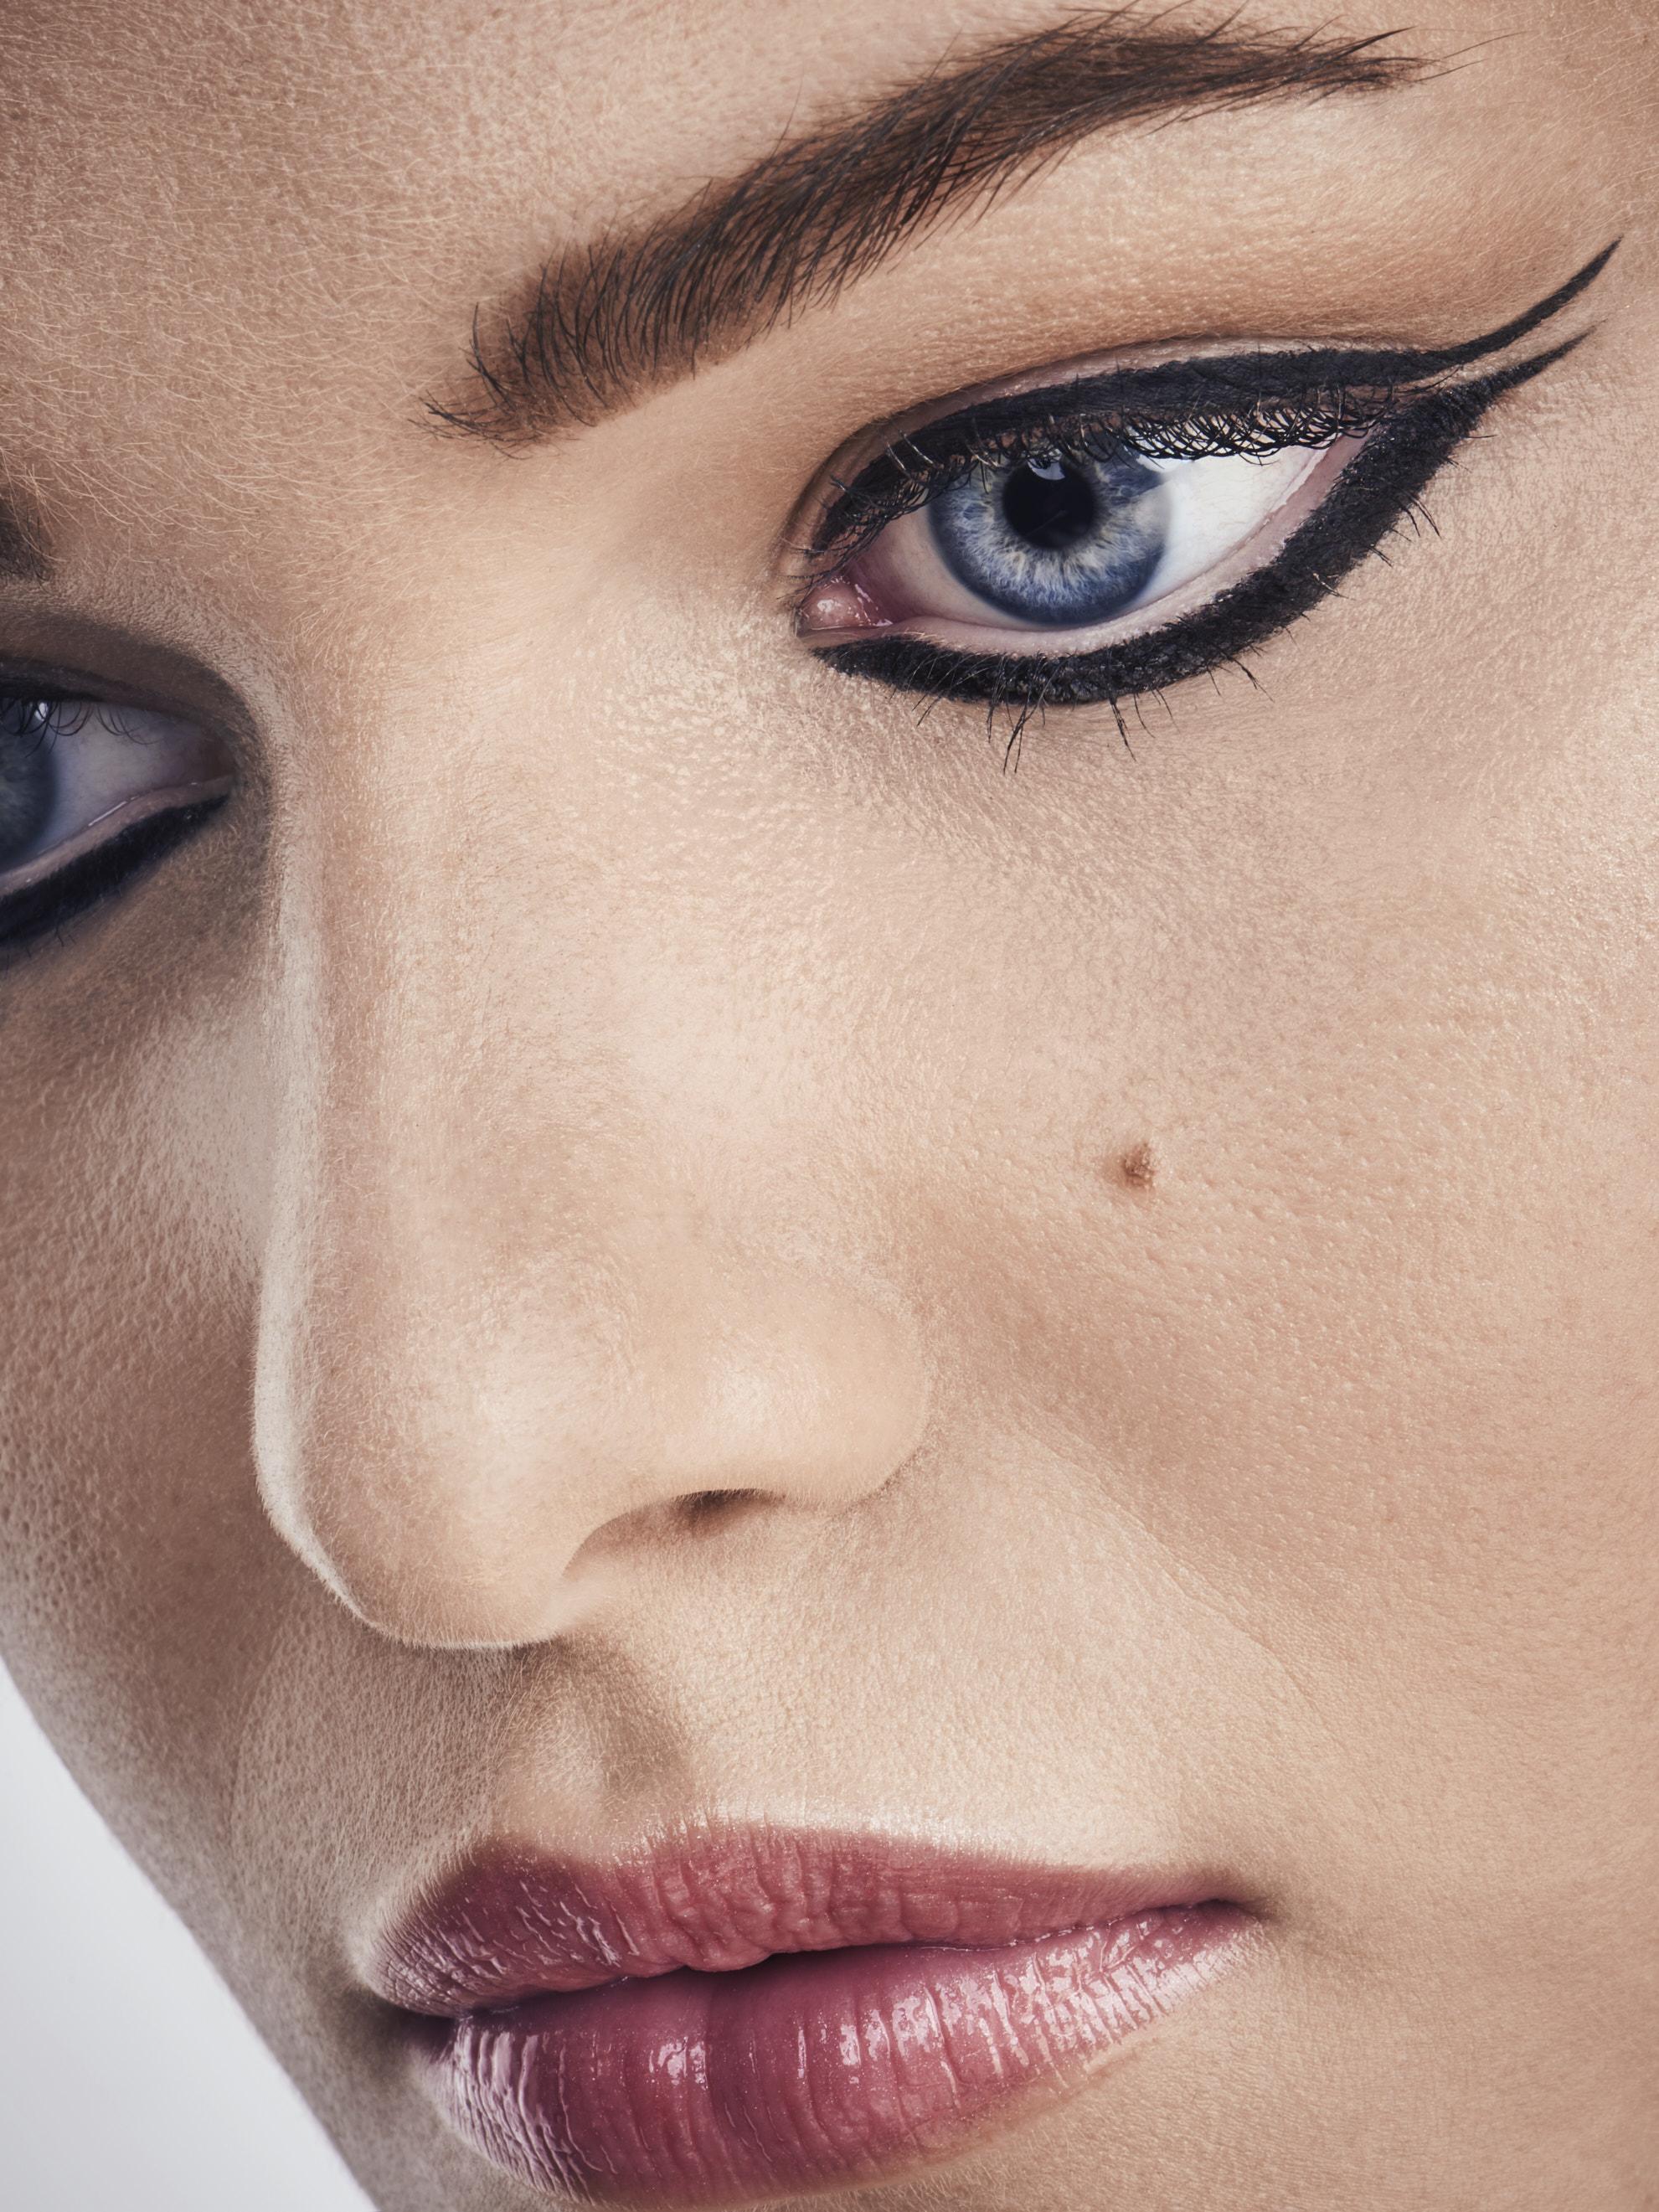 2019-08-10-Ashley-creativ-makeup9196.jpg